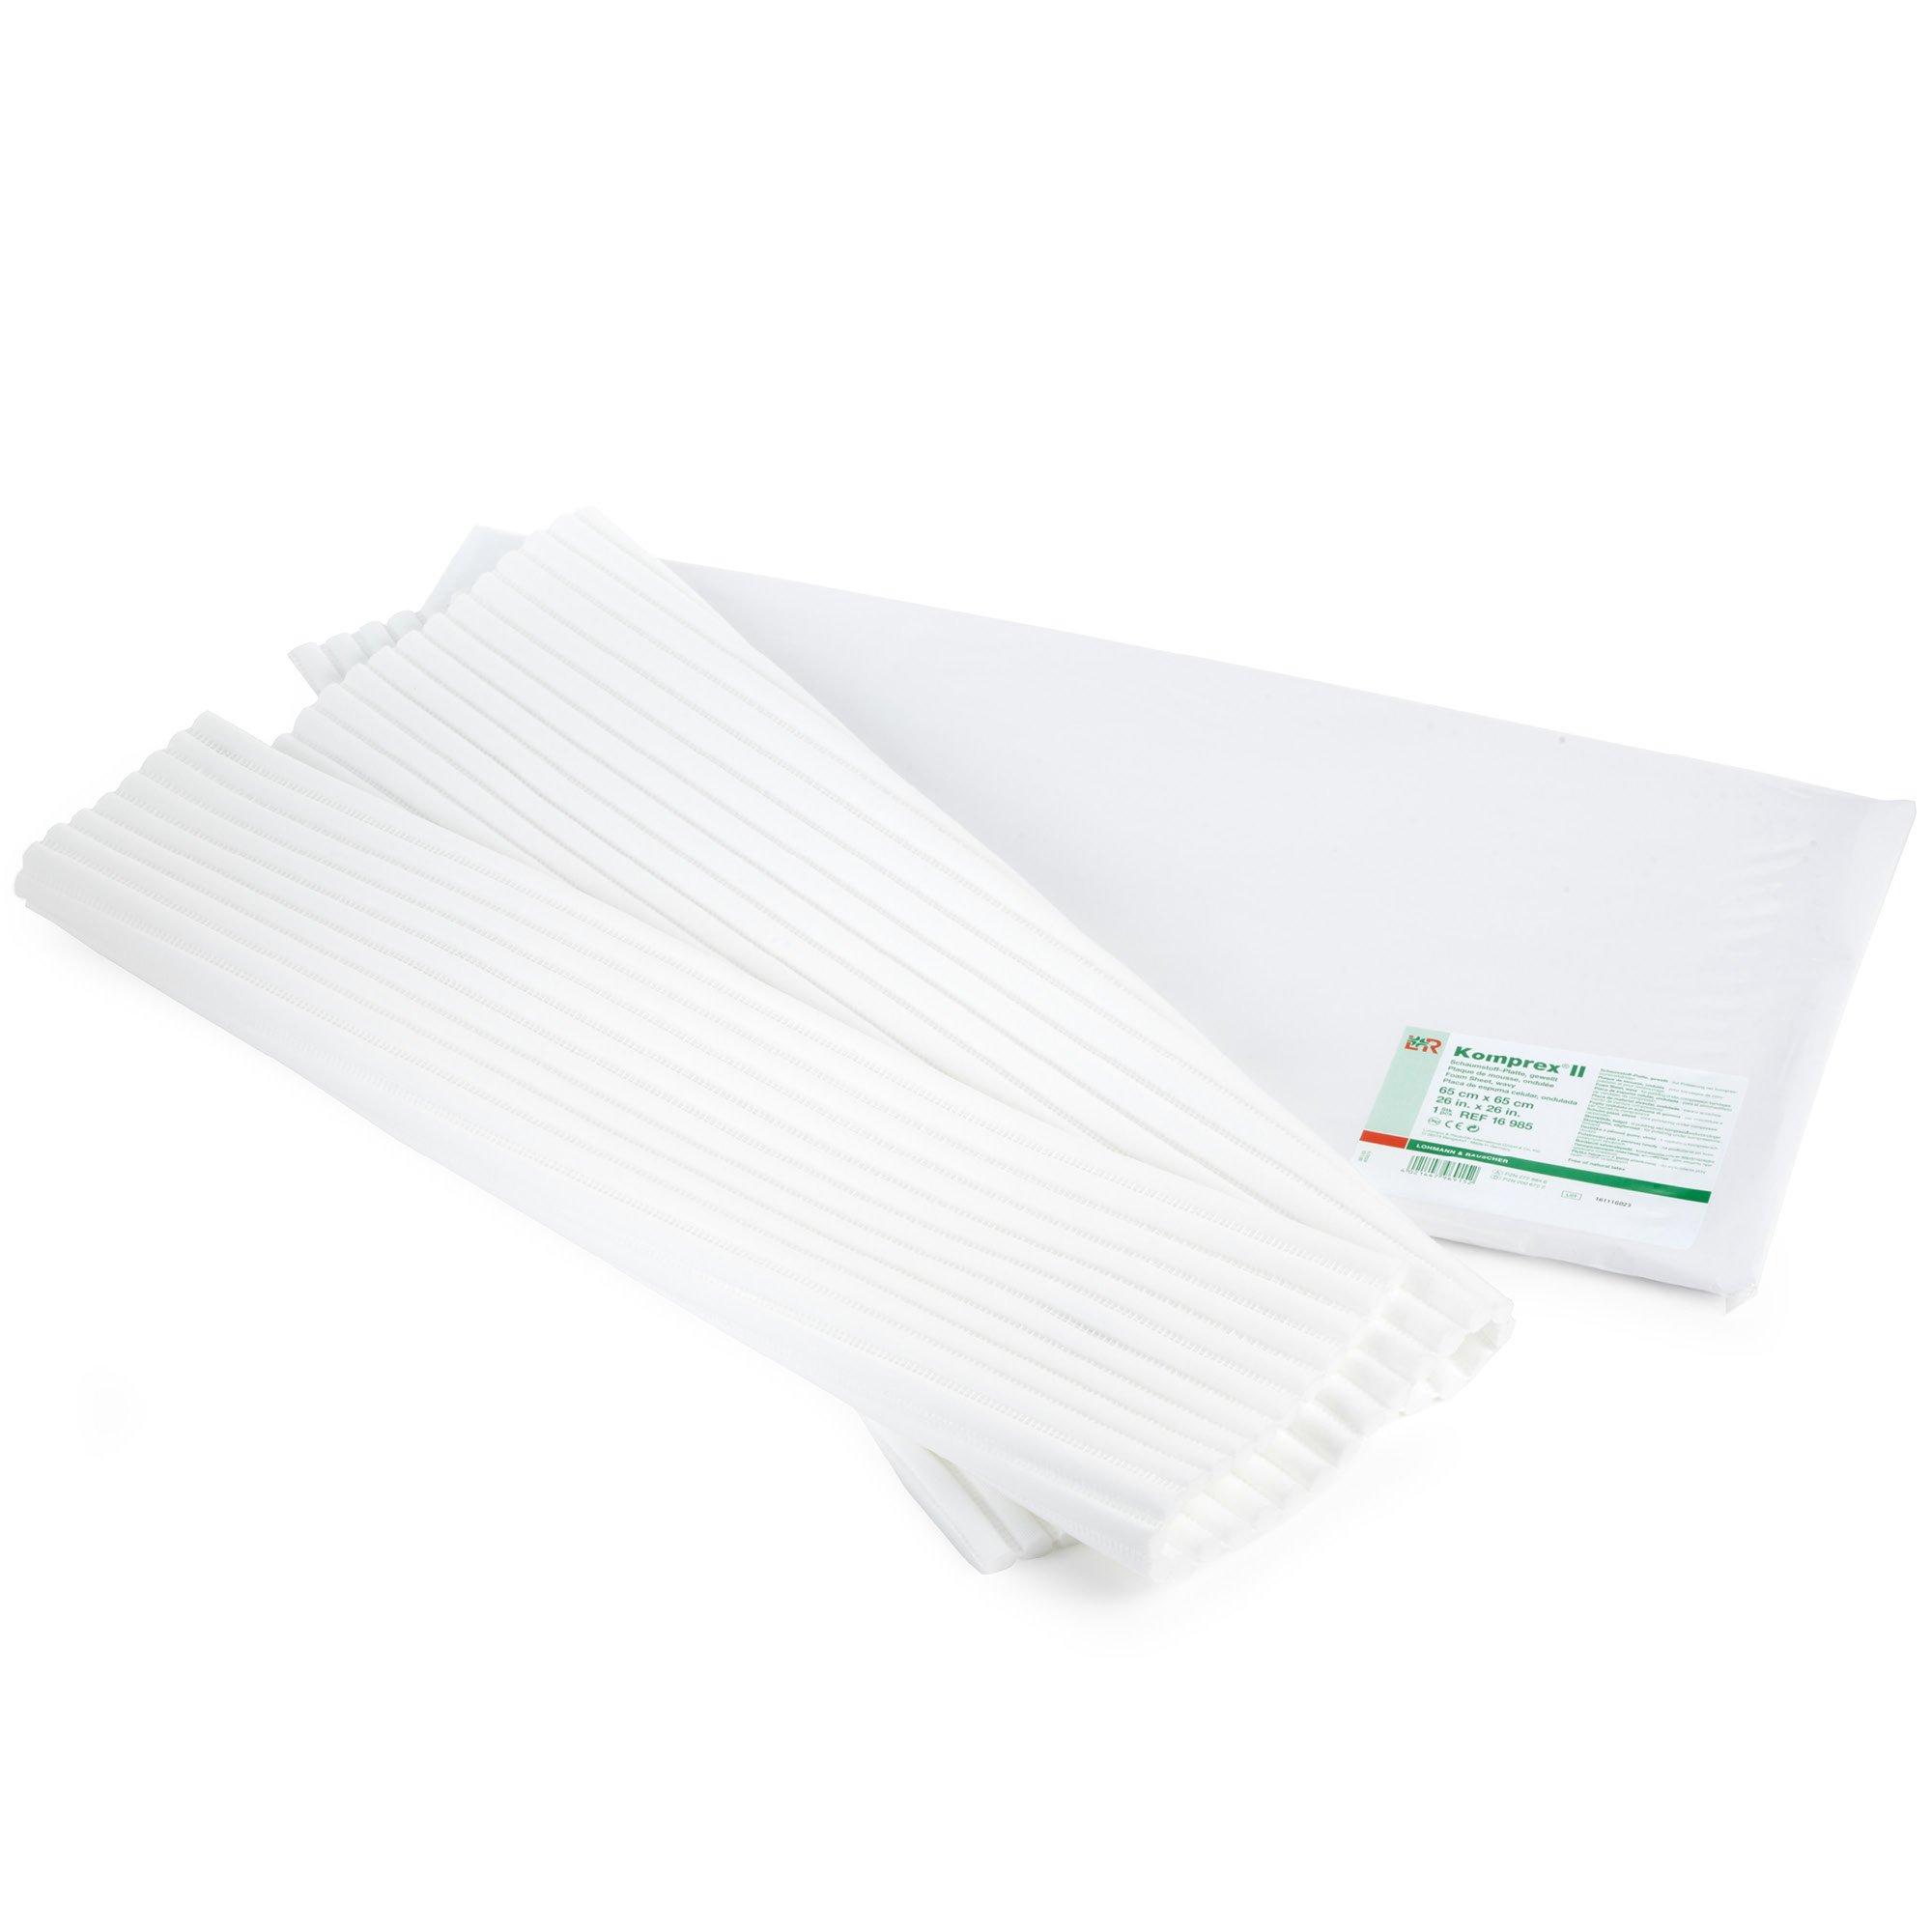 Komprex II Sheet, Channel Foam Dressing for Lymphedema, Spaghetti Foam with Polyester Outer Layer & Open Cell Foam Rubber Core, 25.7 (65 cm) Square Sheet